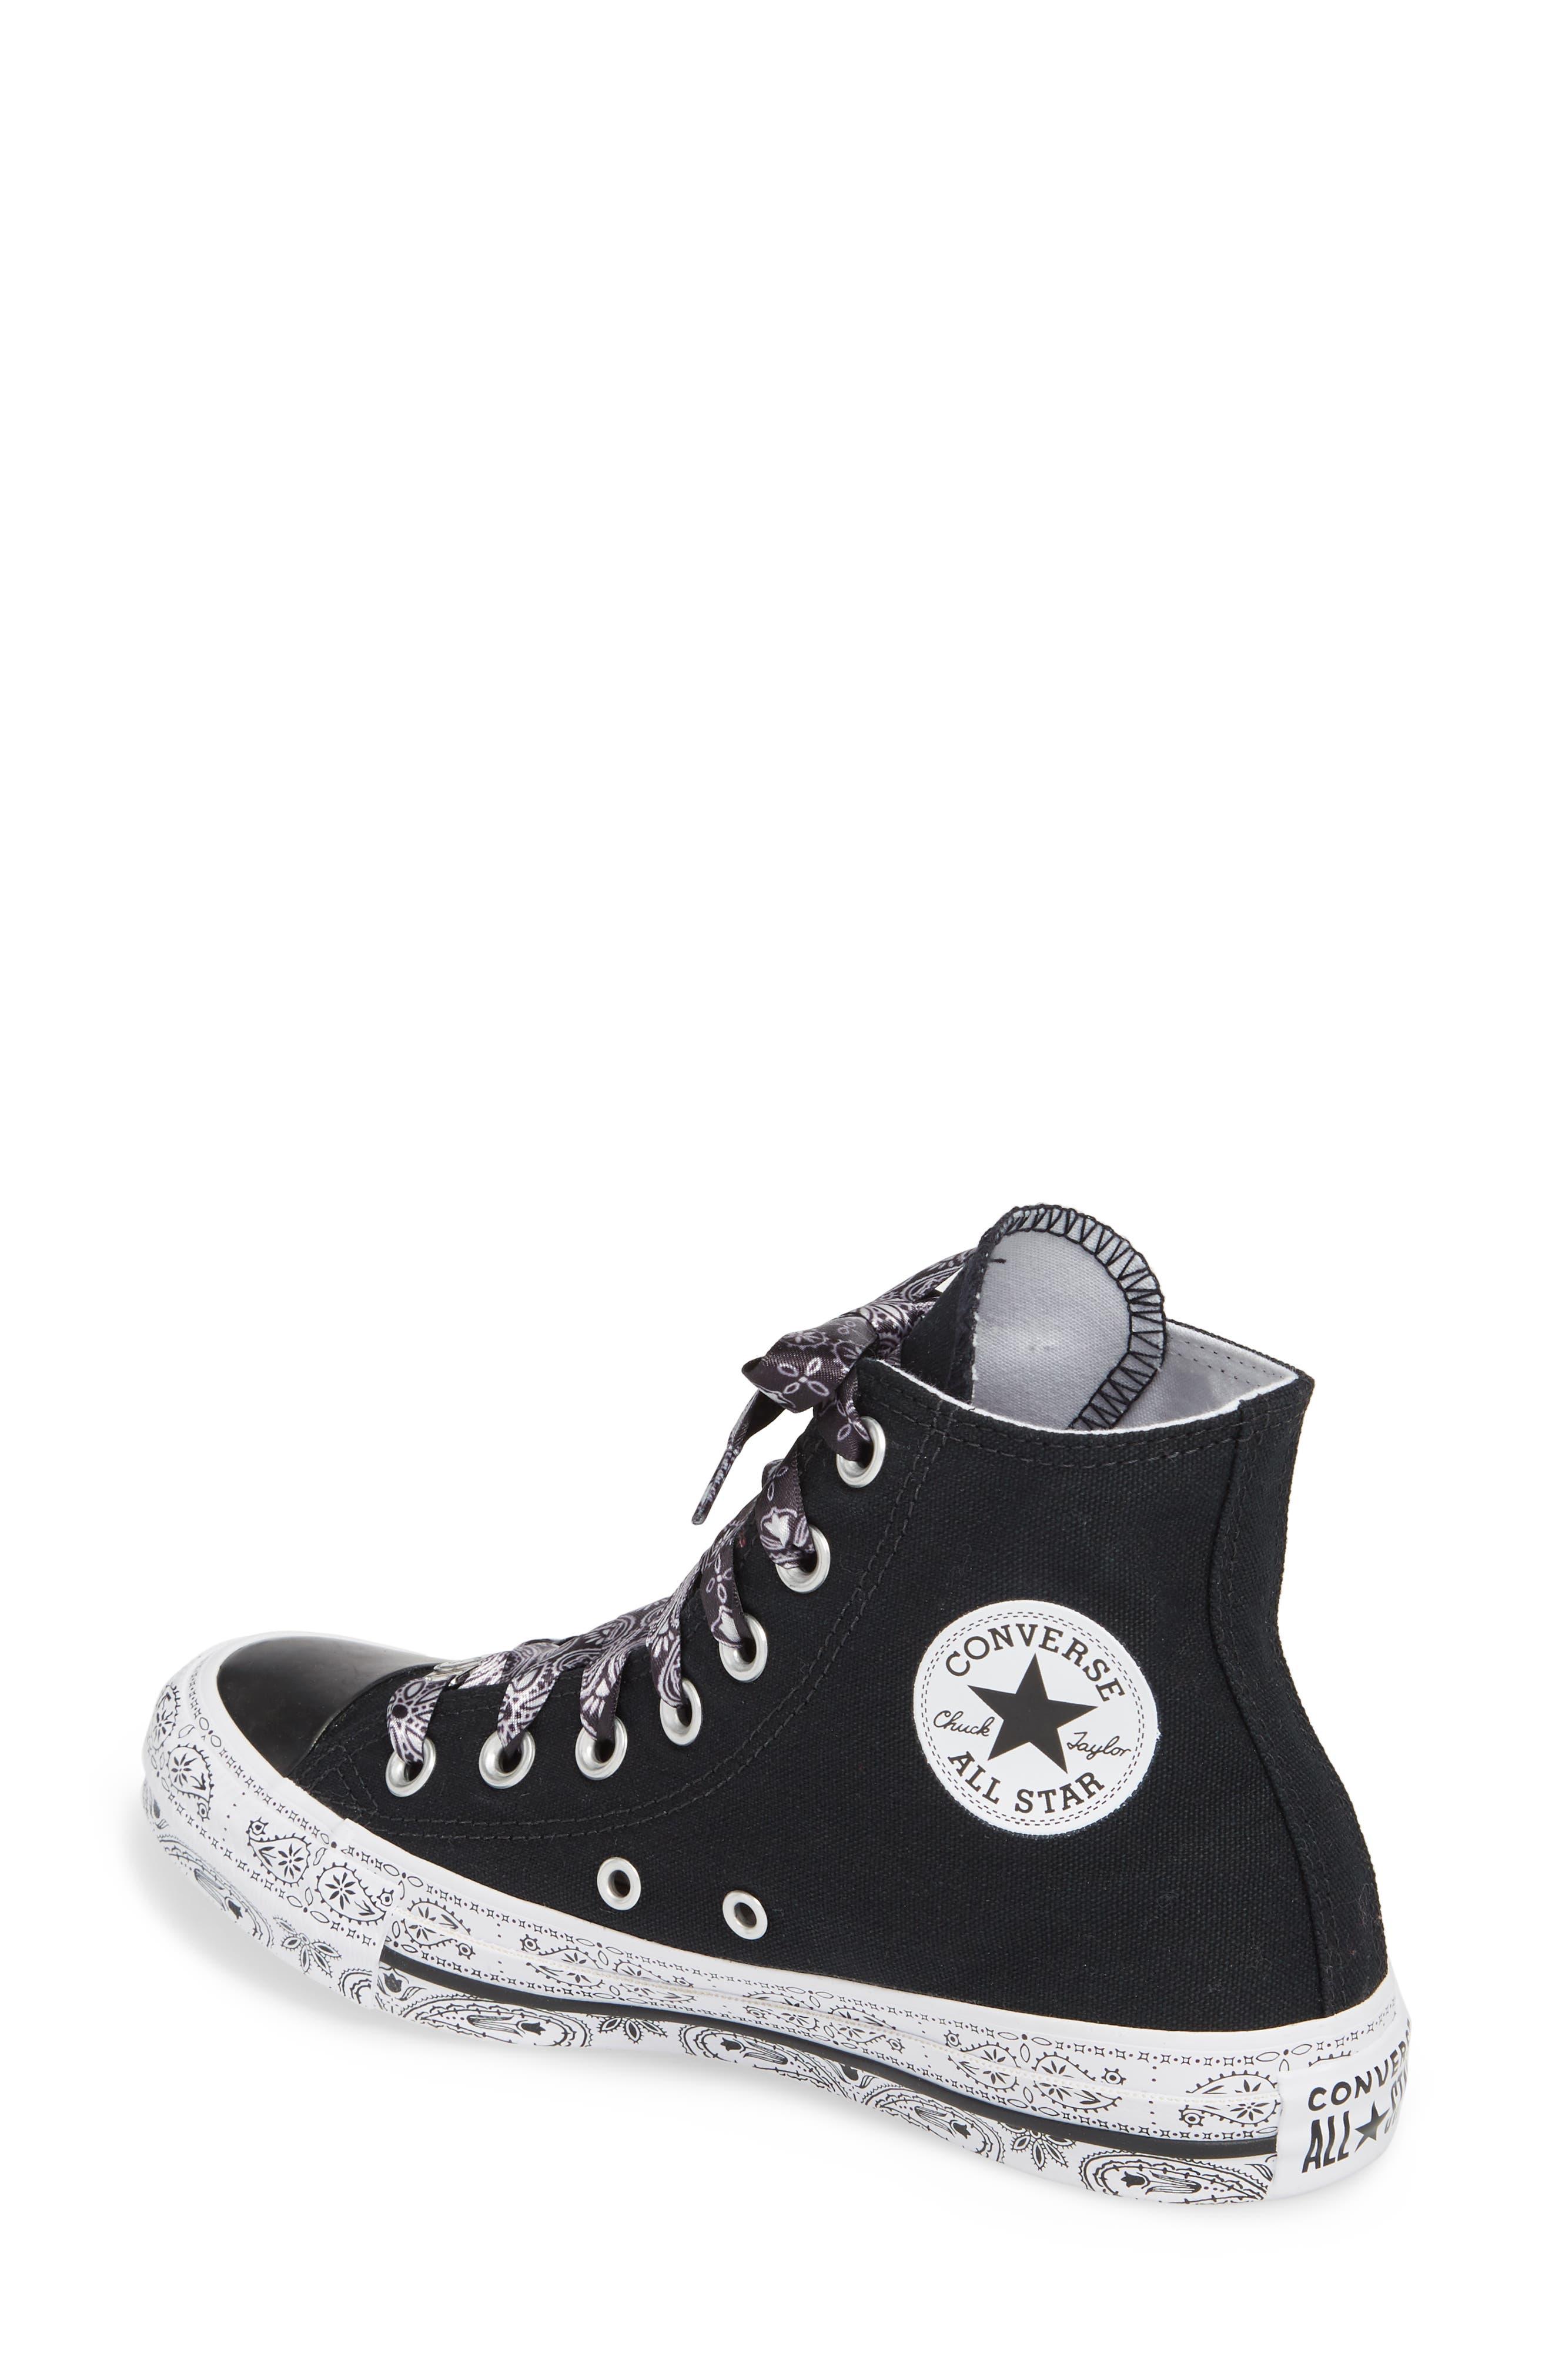 CONVERSE,                             x Miley Cyrus Chuck Taylor All Star Bandana High Top Sneaker,                             Alternate thumbnail 2, color,                             001